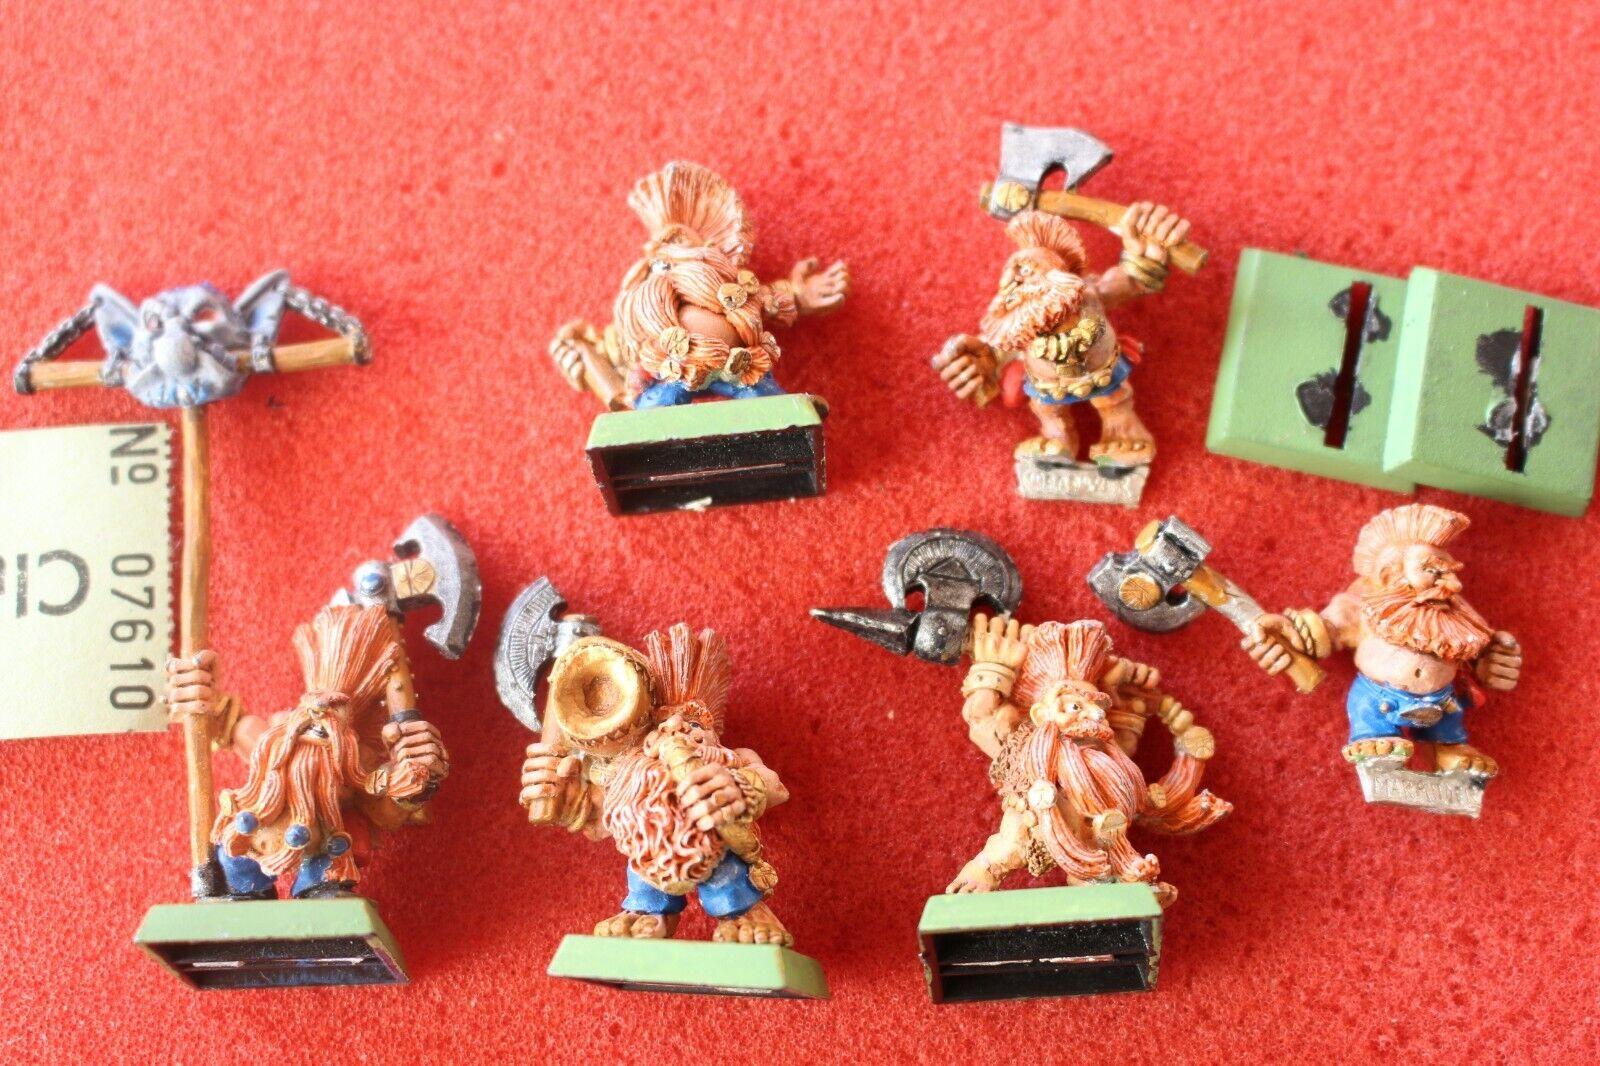 Games Workshop Warhammer Dwarf Trollslayers Troll Slayers Metal Figures Painted